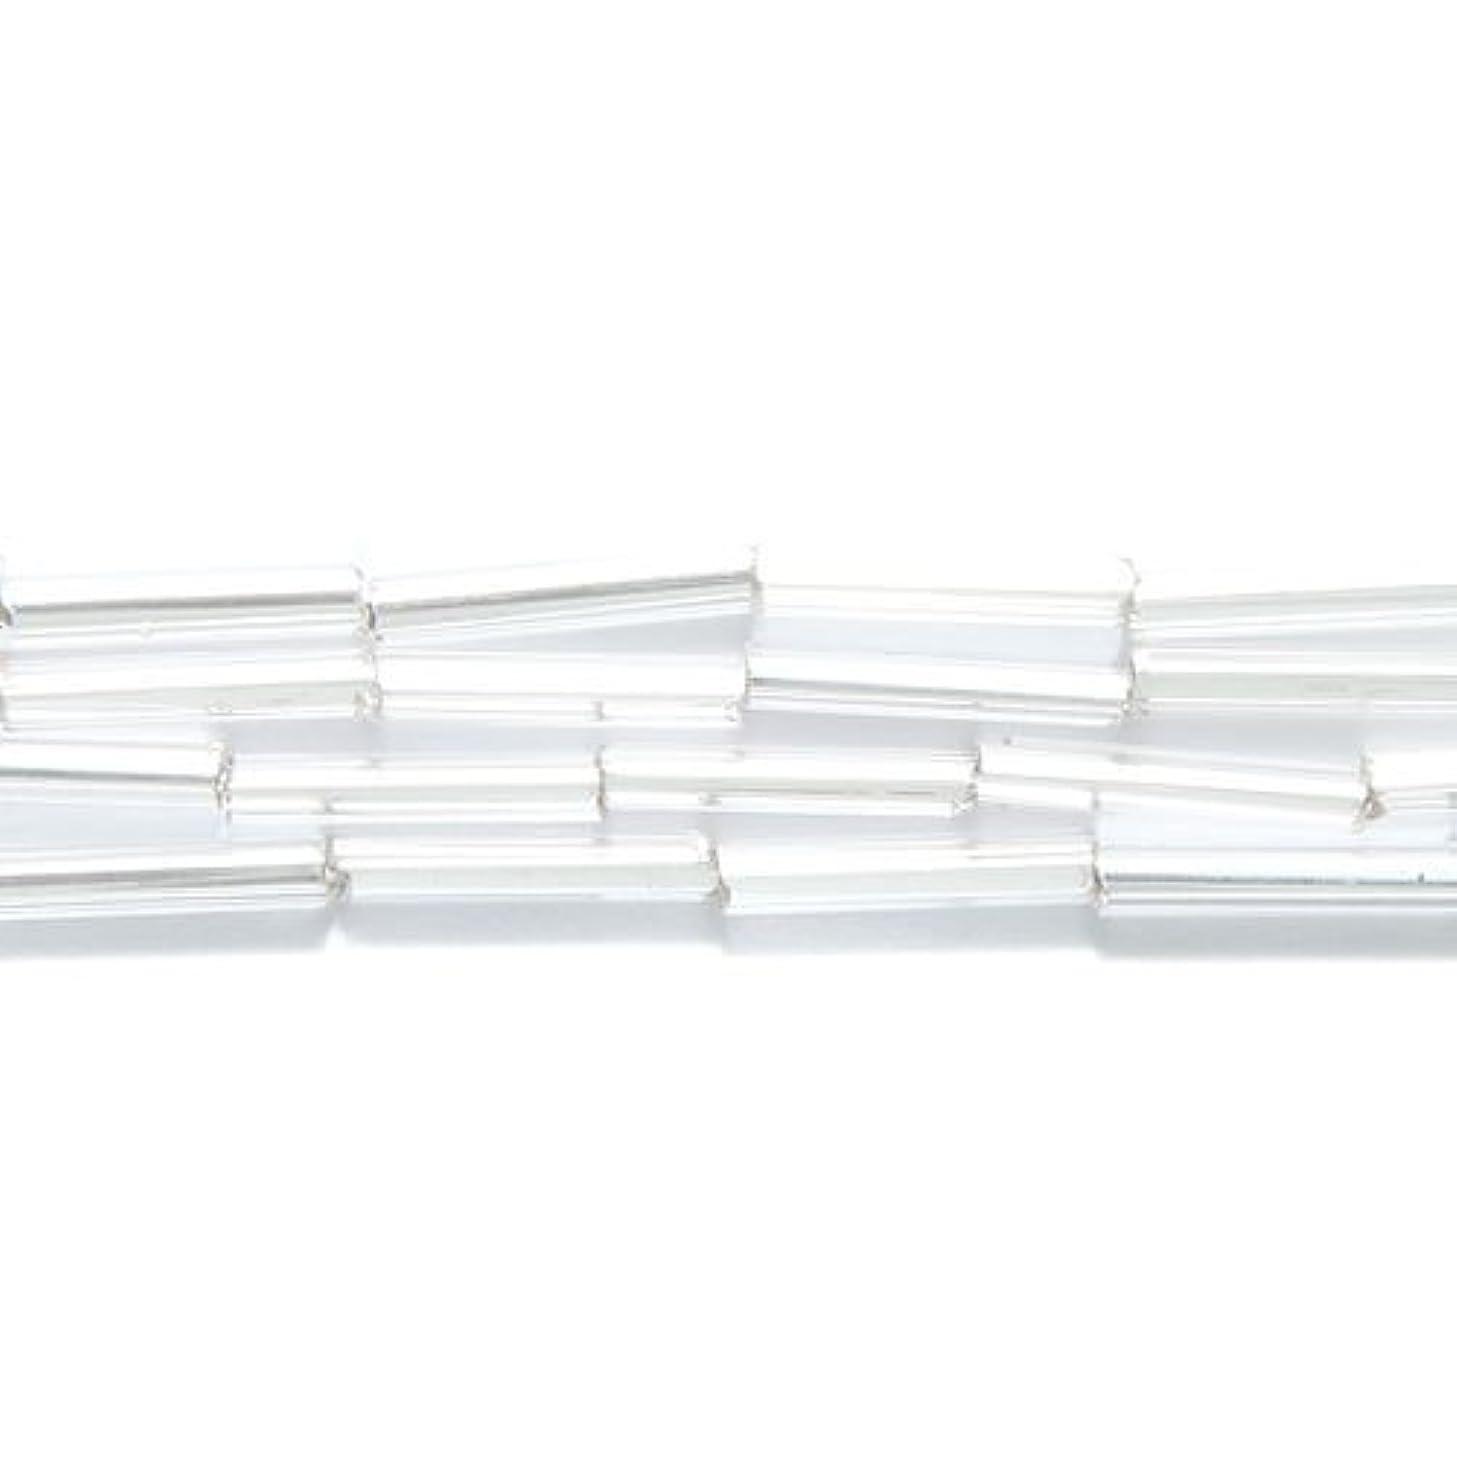 Preciosa Ornela Czech Straight Bugle Glass Bead No.5, 2 by 11mm, Silver Lined, Crystal